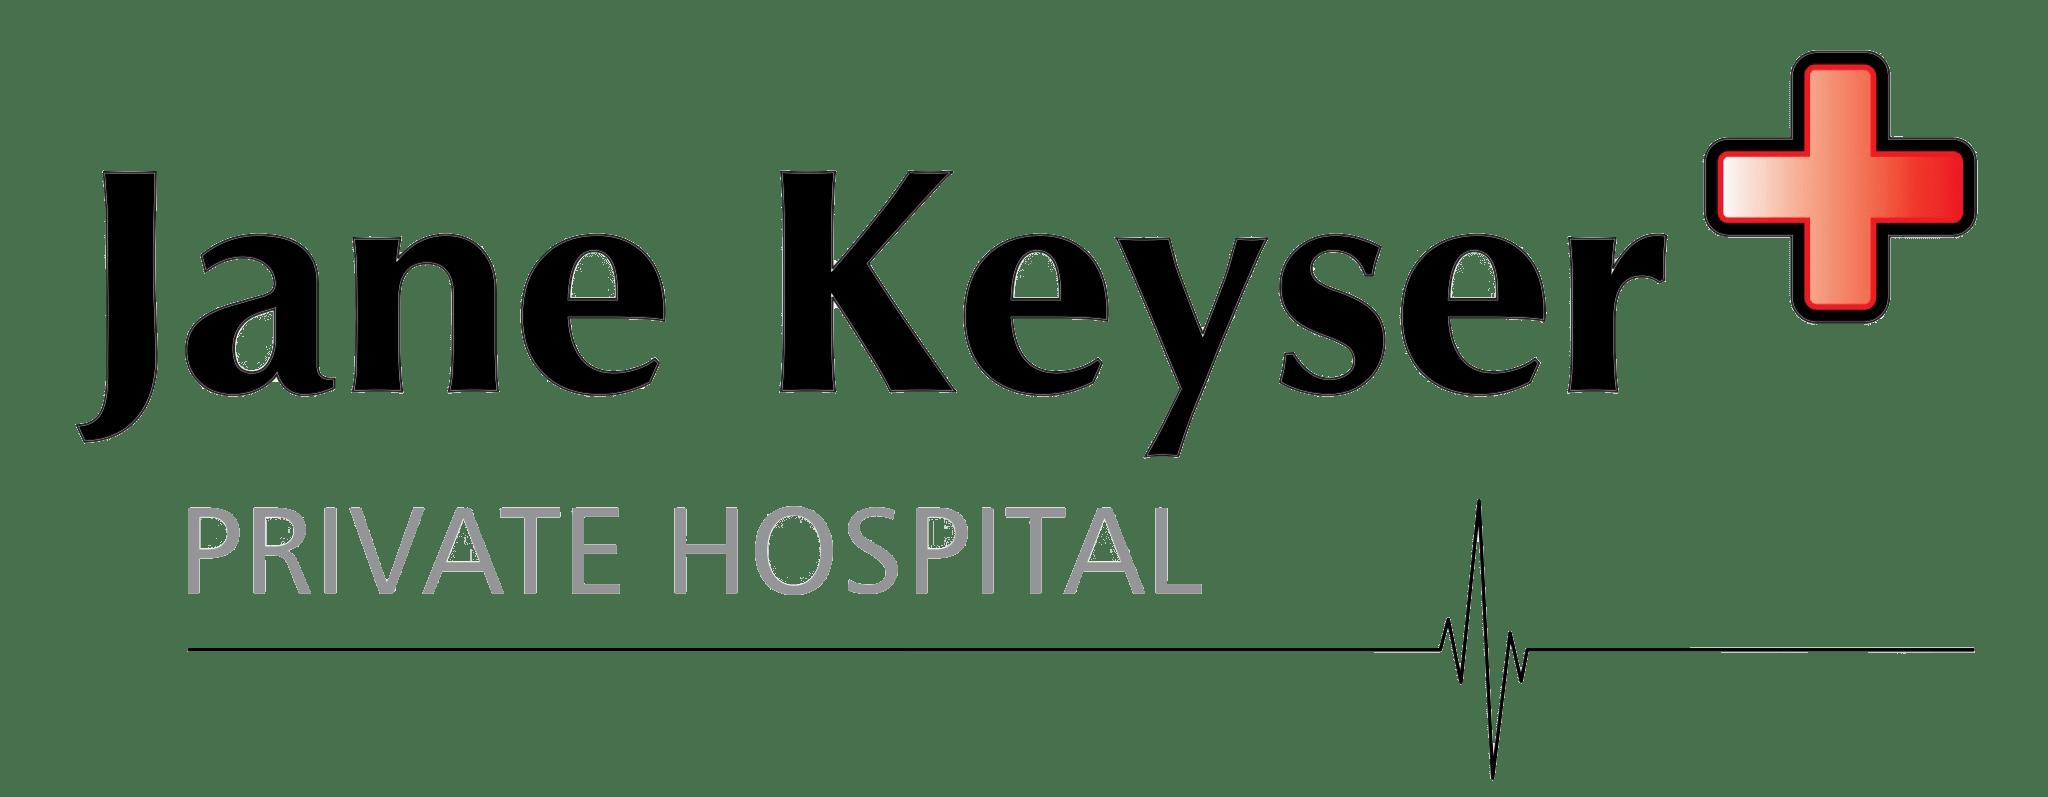 Jane Keyser Private Hospital